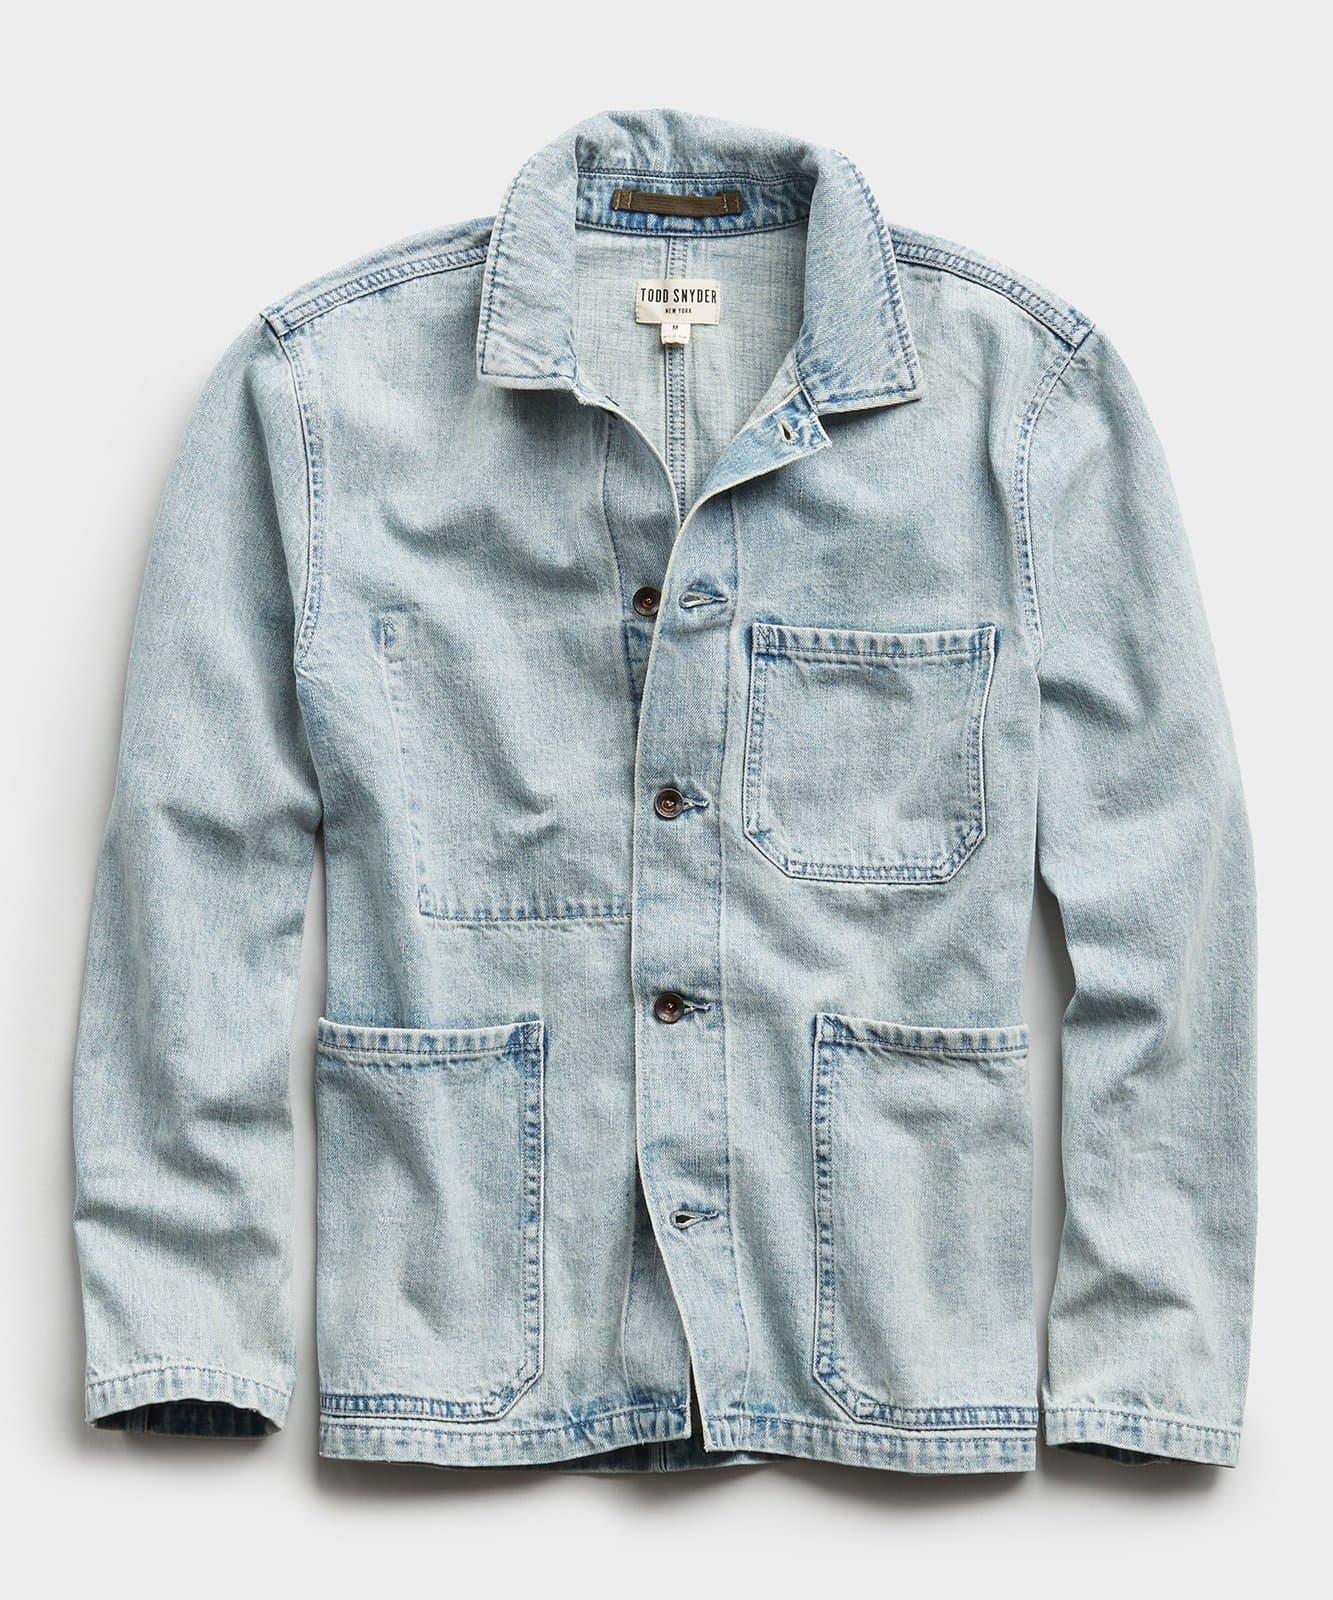 seaside chore shirt todd snyder